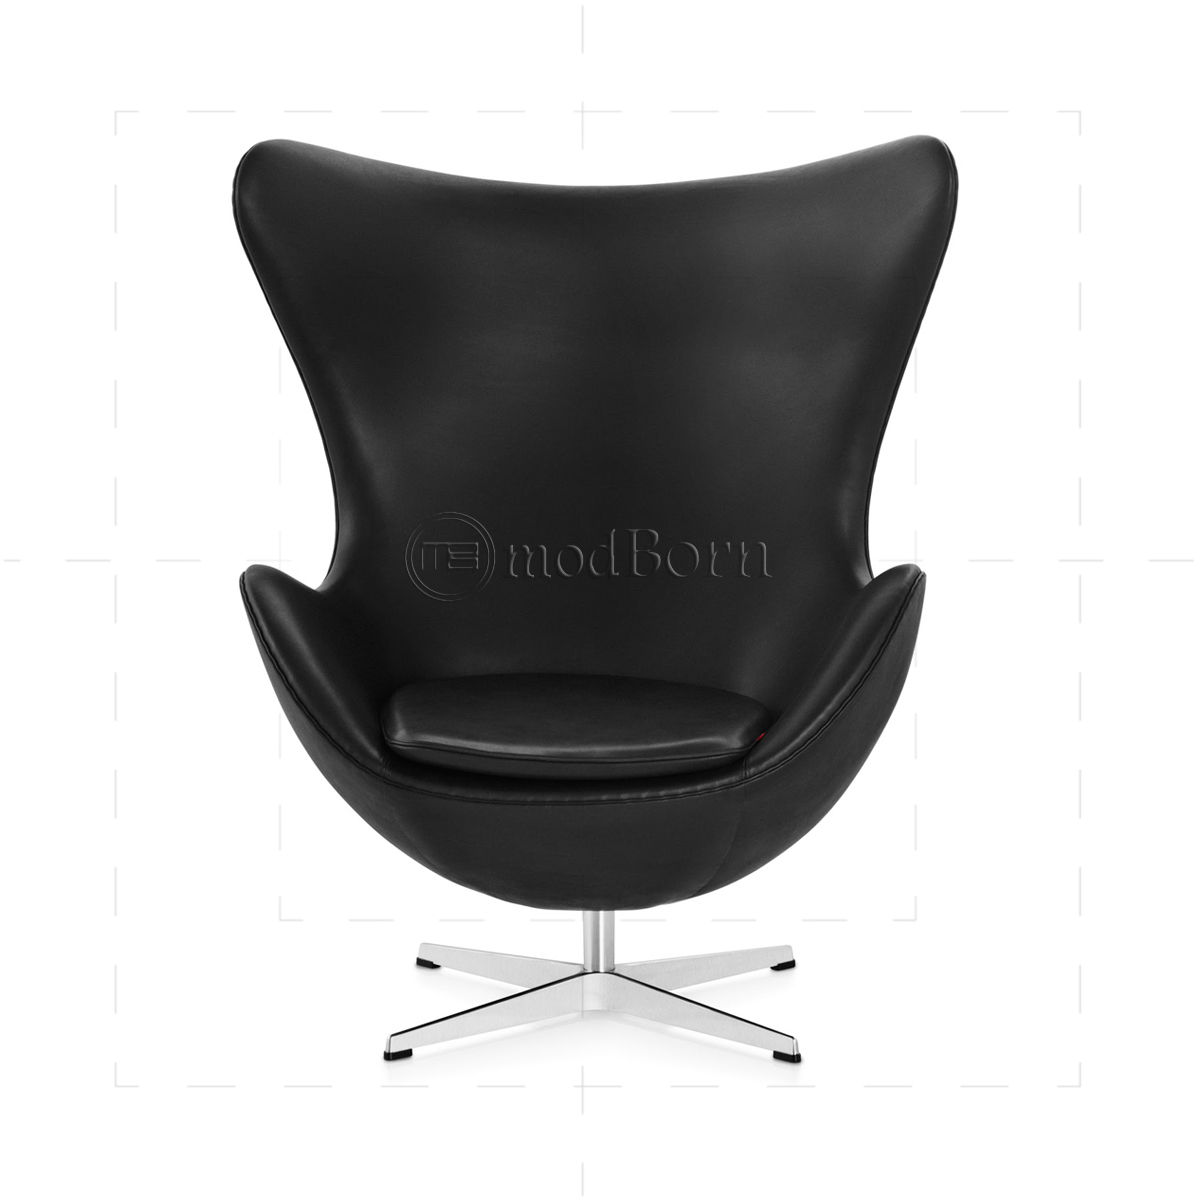 arne jacobsen style egg chair black leather aniline leather arne jacobsen egg chair replica